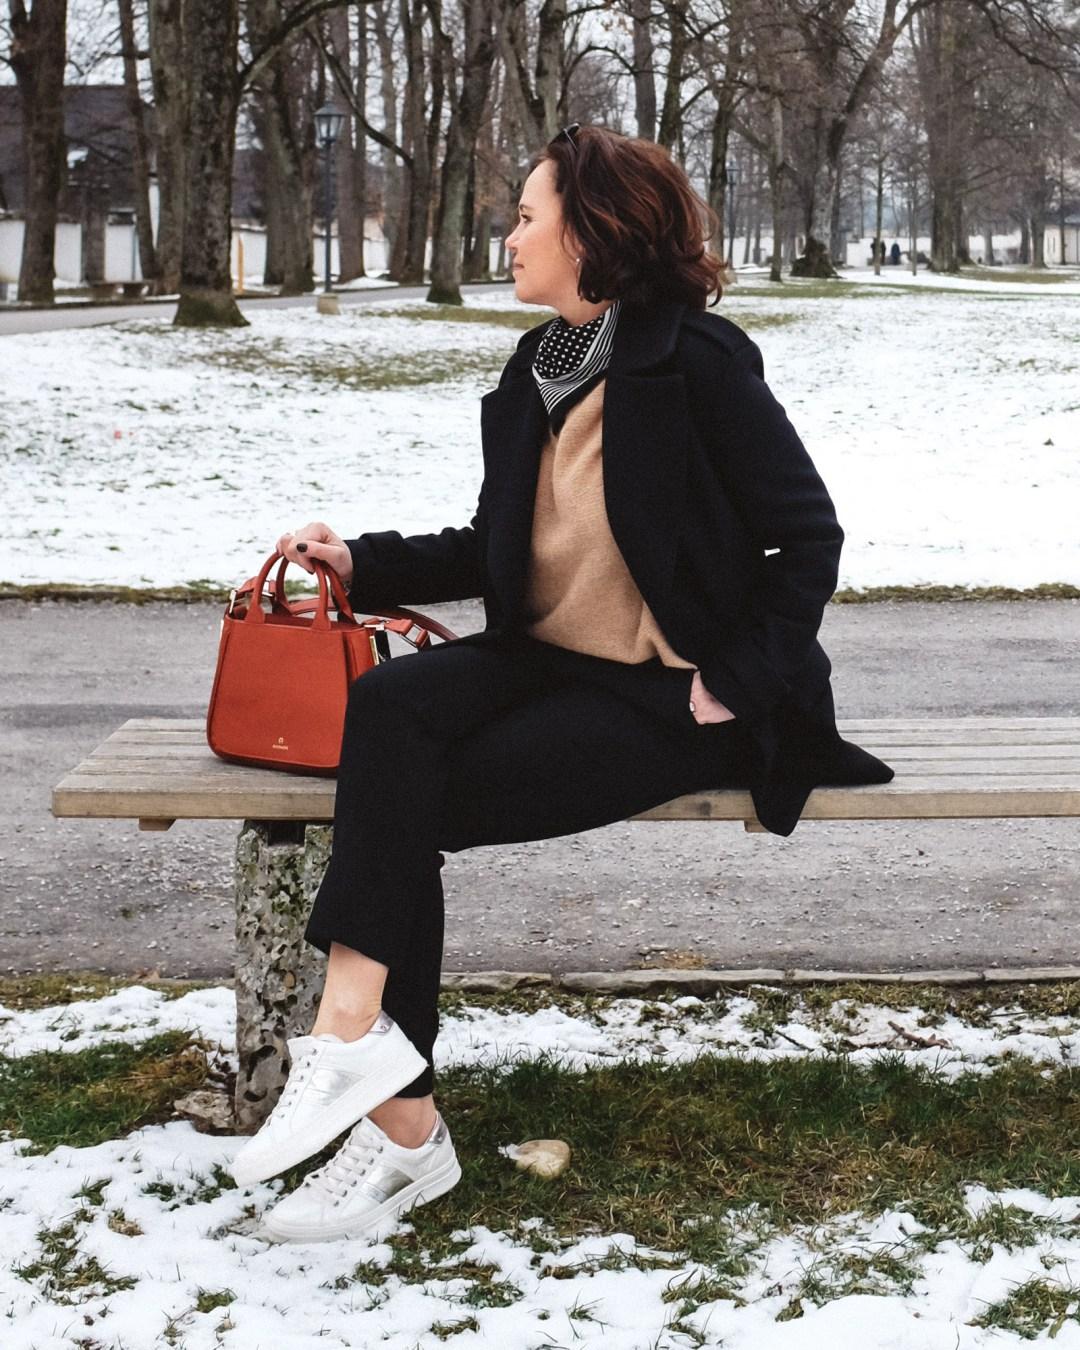 inastil, Ü50Blogger, Modeberatung, Stilberatung, Ü50Mode, Styleover50, Cabanjacke, Aignertasche, weisse Sneaker, Casualstyle, Streetstyle-6